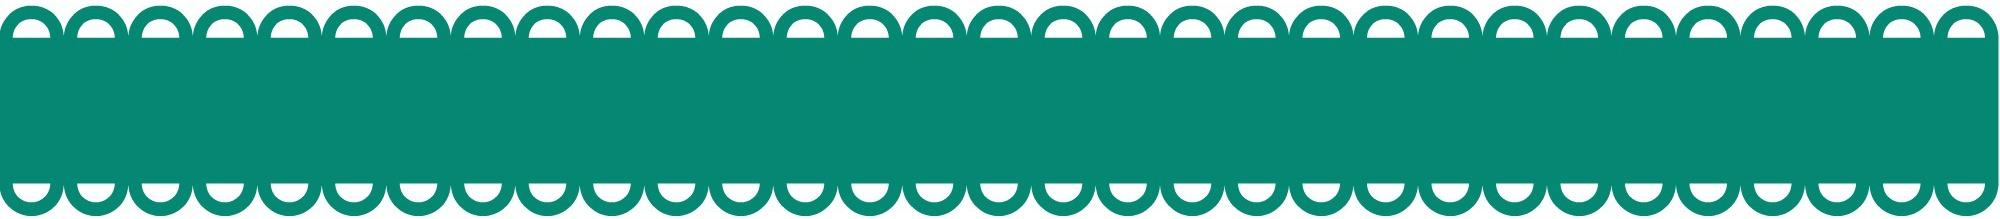 ribbon-banner